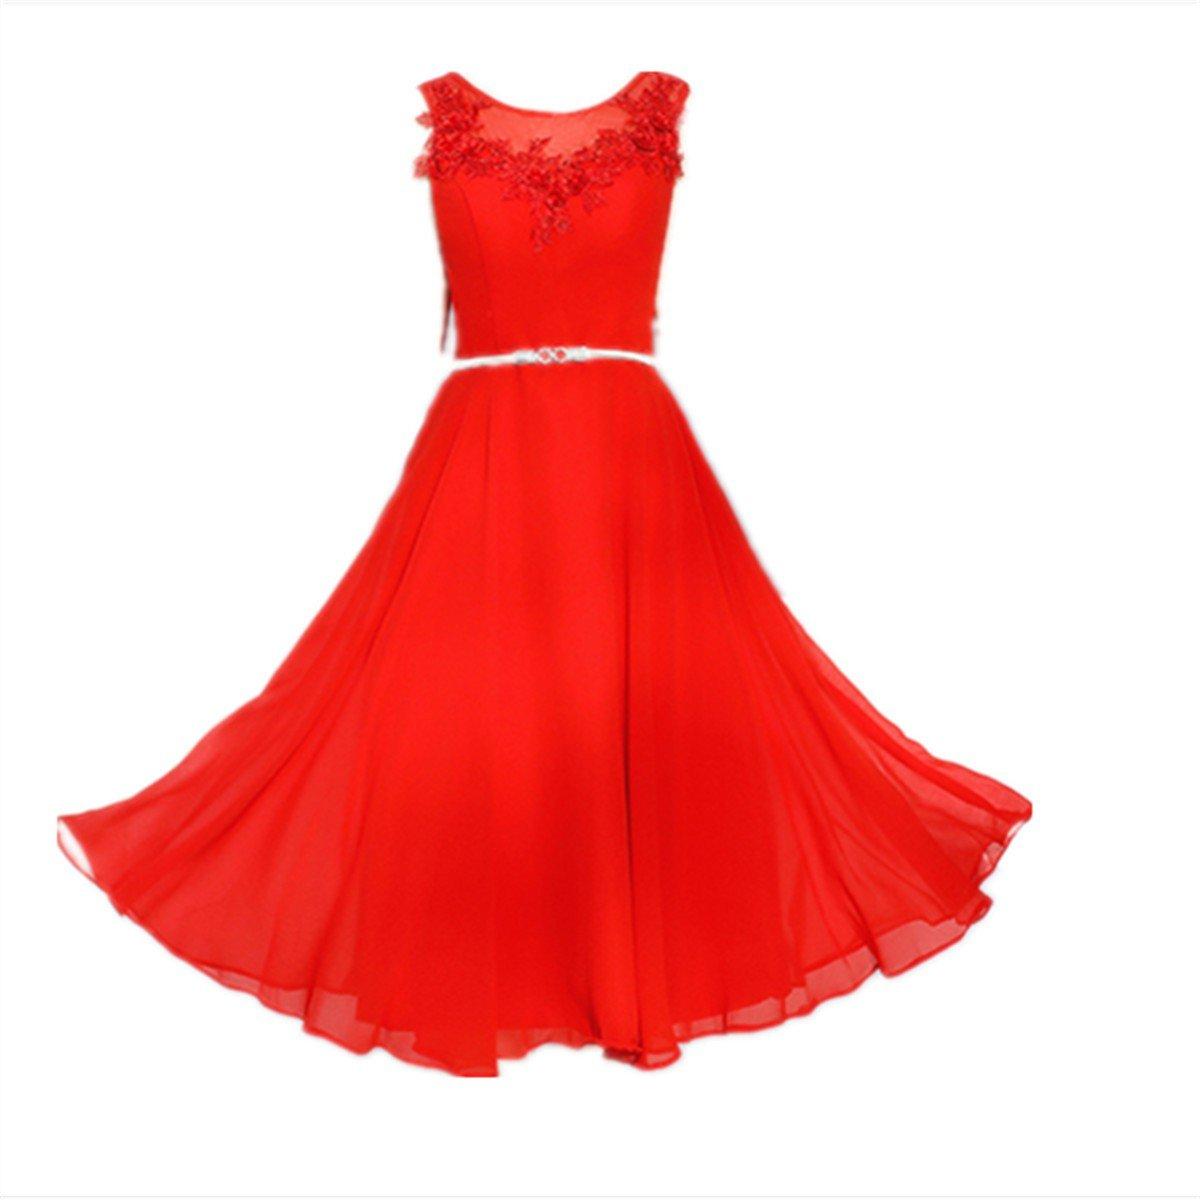 The rouge M JKJHAH Robes De Mariée Robes Robes Dos Nu